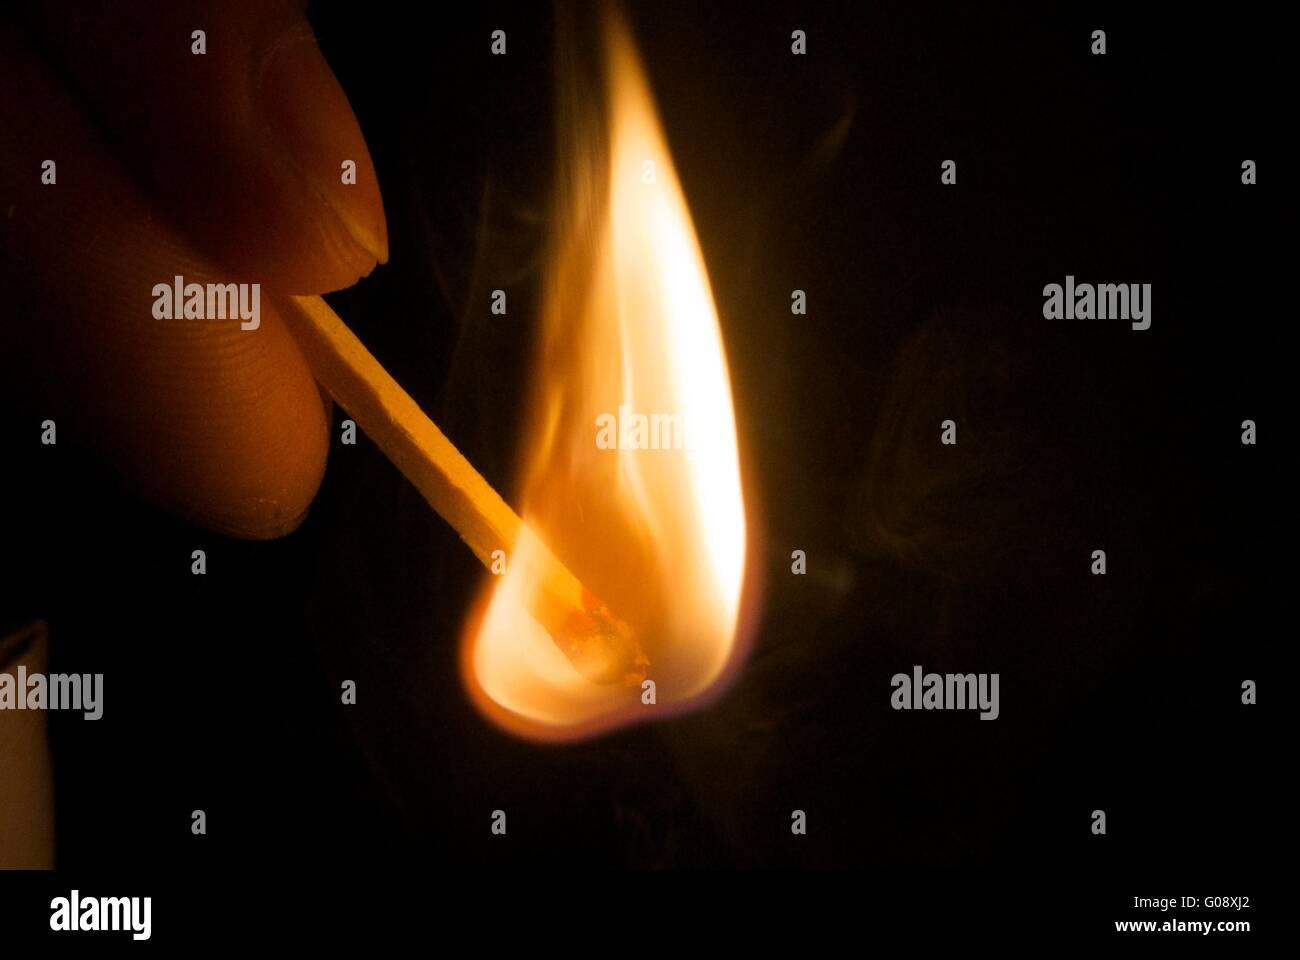 burning matchstick - Stock Image